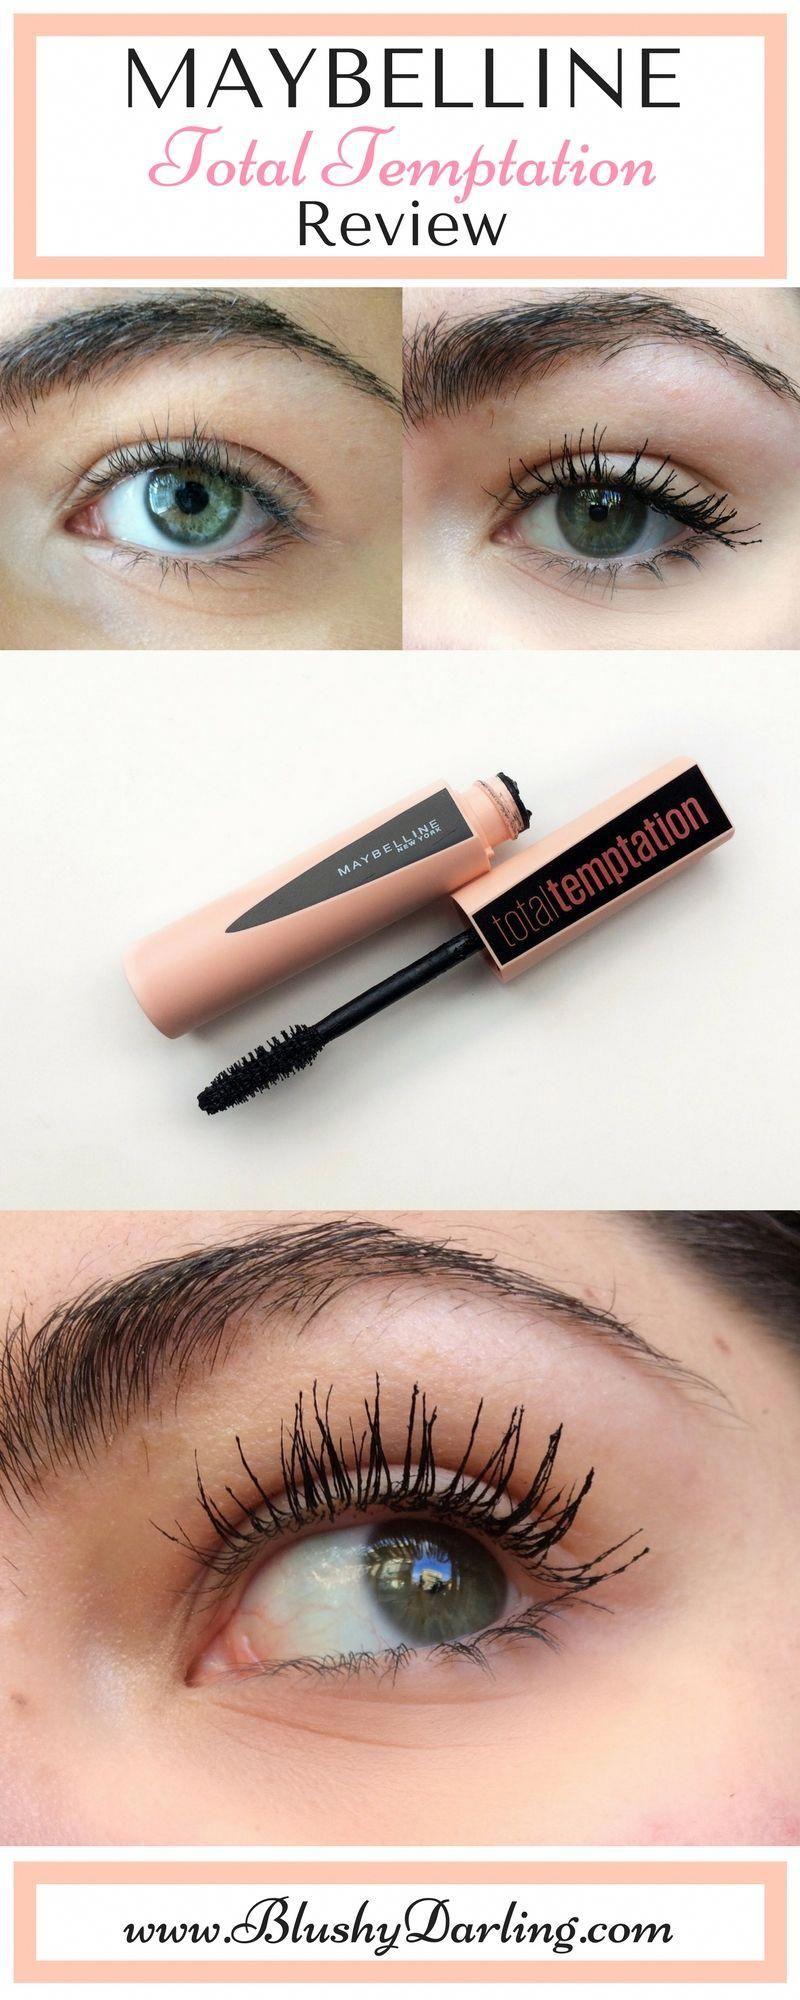 eb652d5433d Maybelline Total Temptation Review Drugstore Mascara #makeup #diymascara